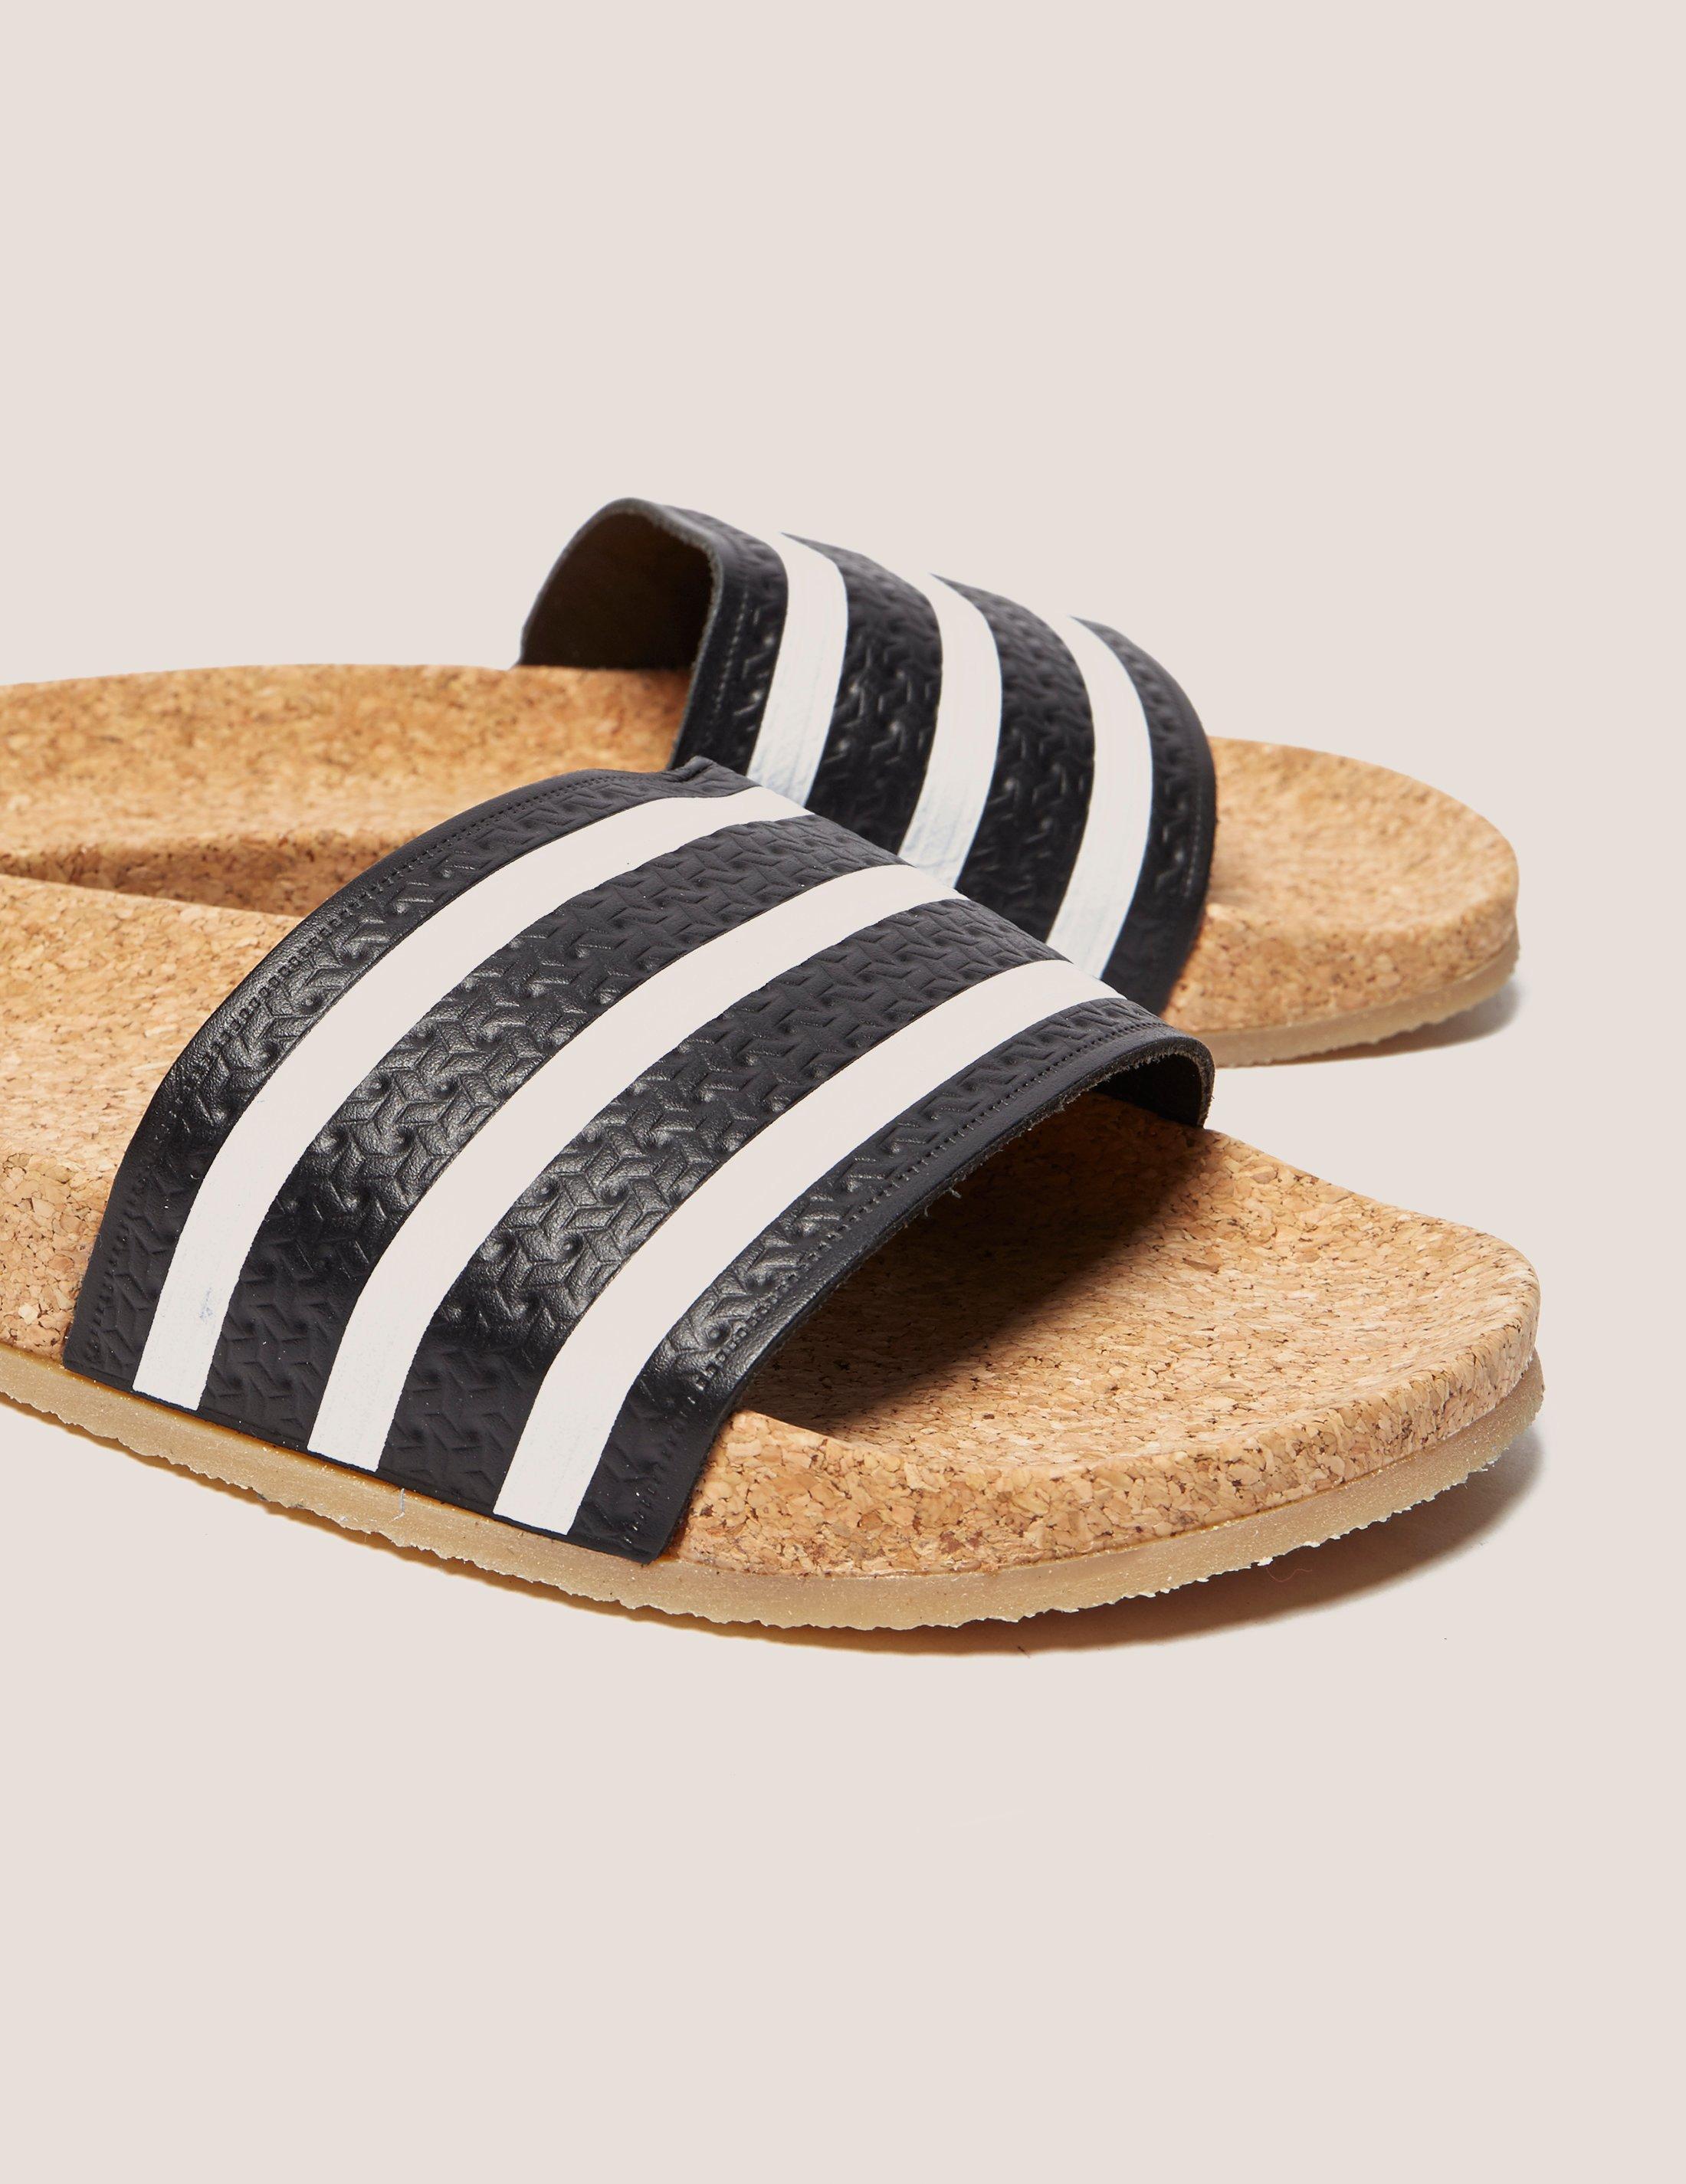 47e8795077a95 adidas Originals Adilette Cork Slides - Lyst